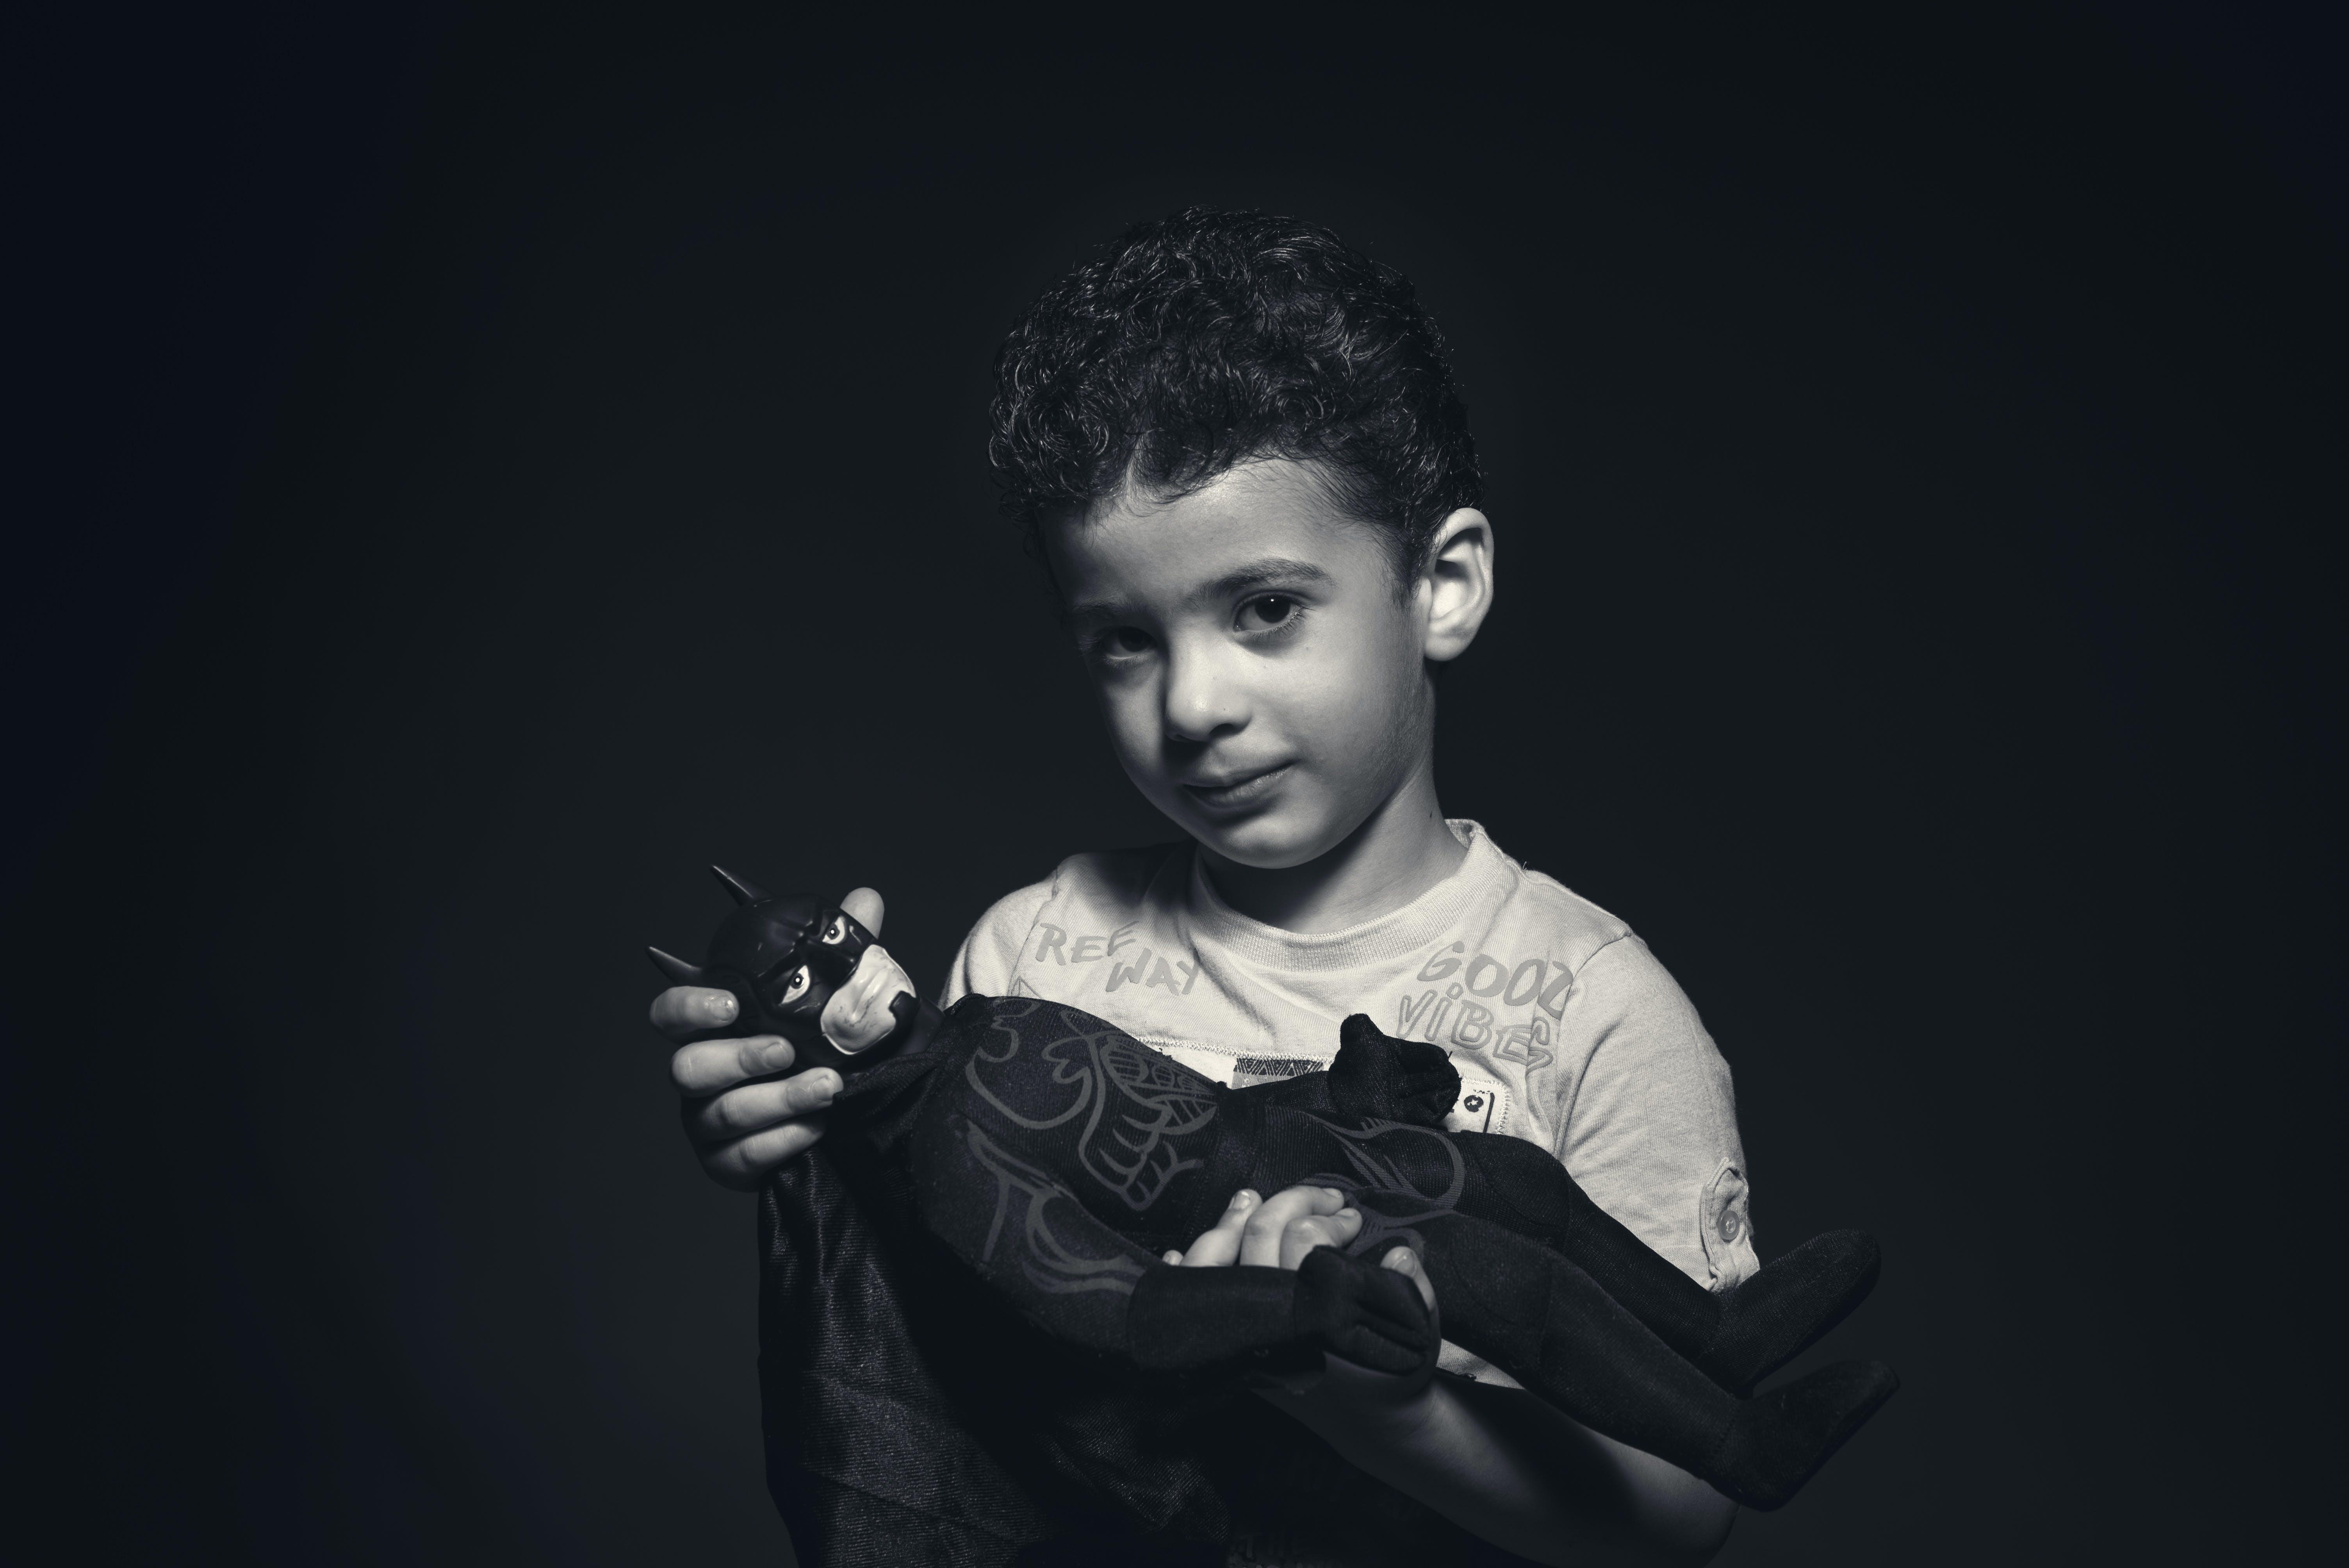 Grayscale Photo of a boy Holding Batman Plush Toy